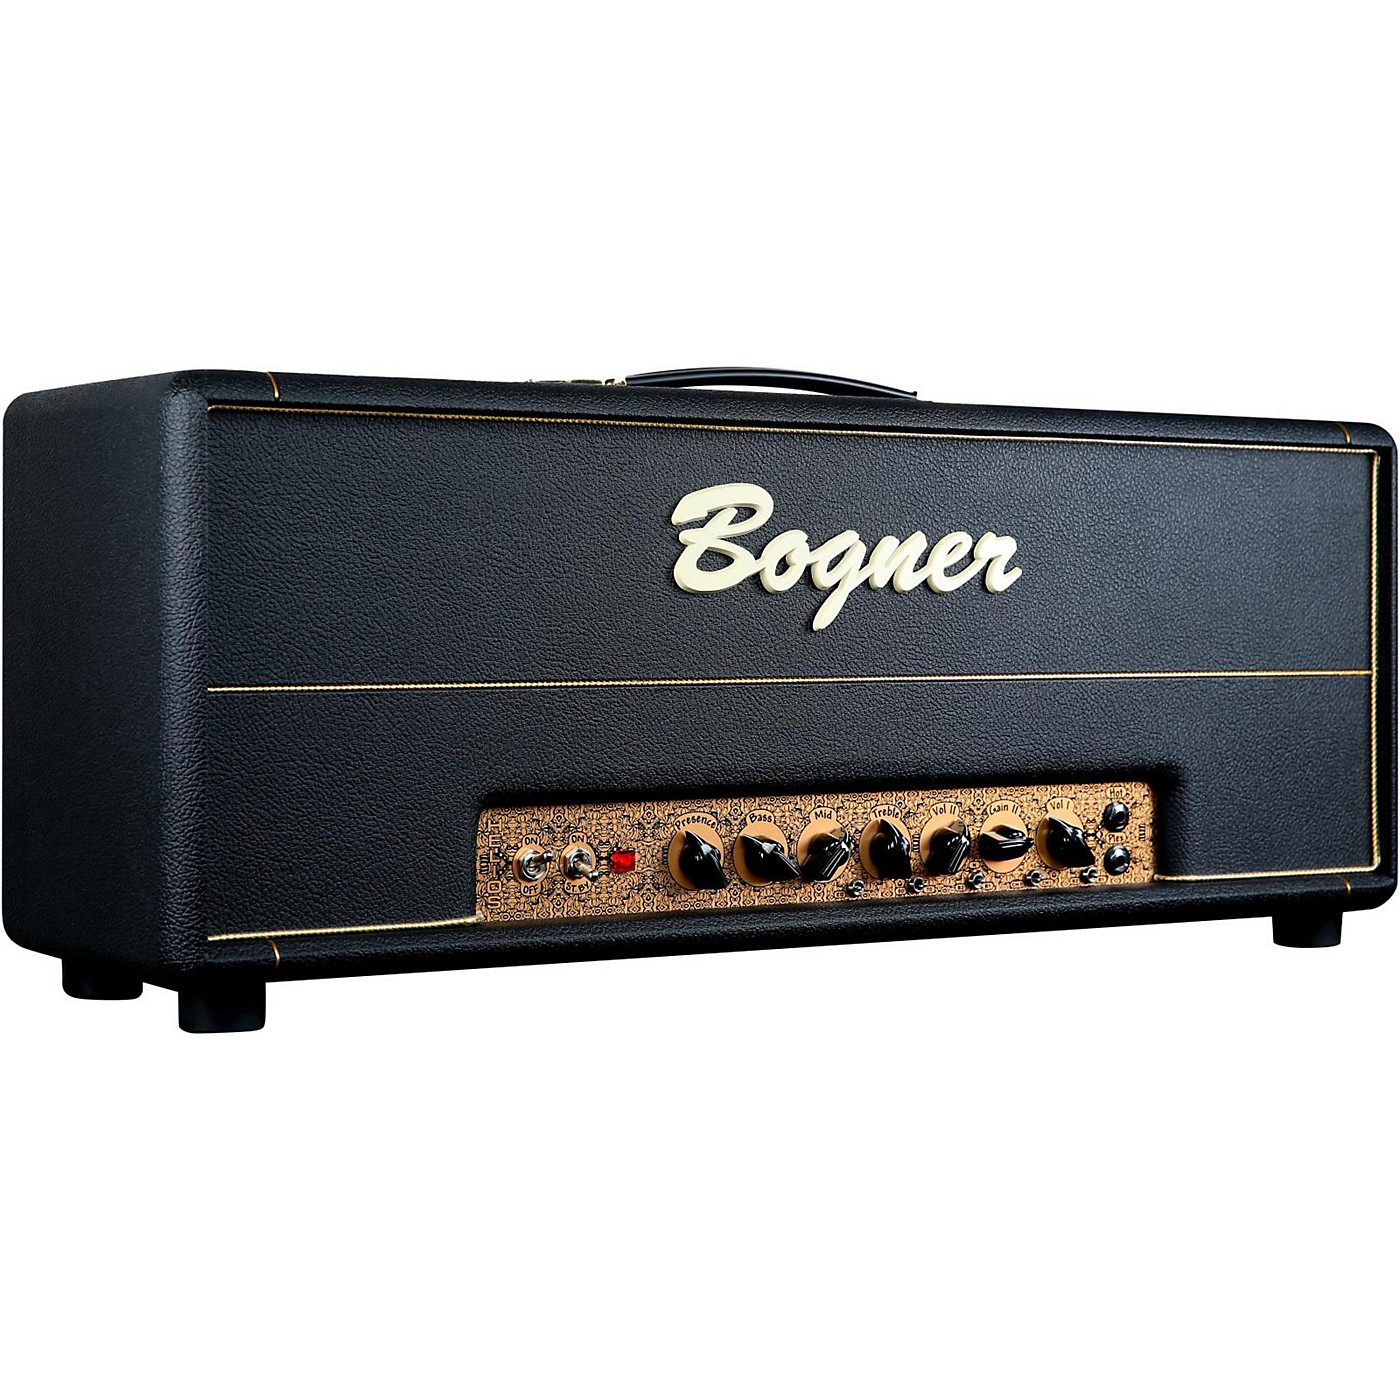 Bogner Helios 100W Tube Guitar Amp Head thumbnail